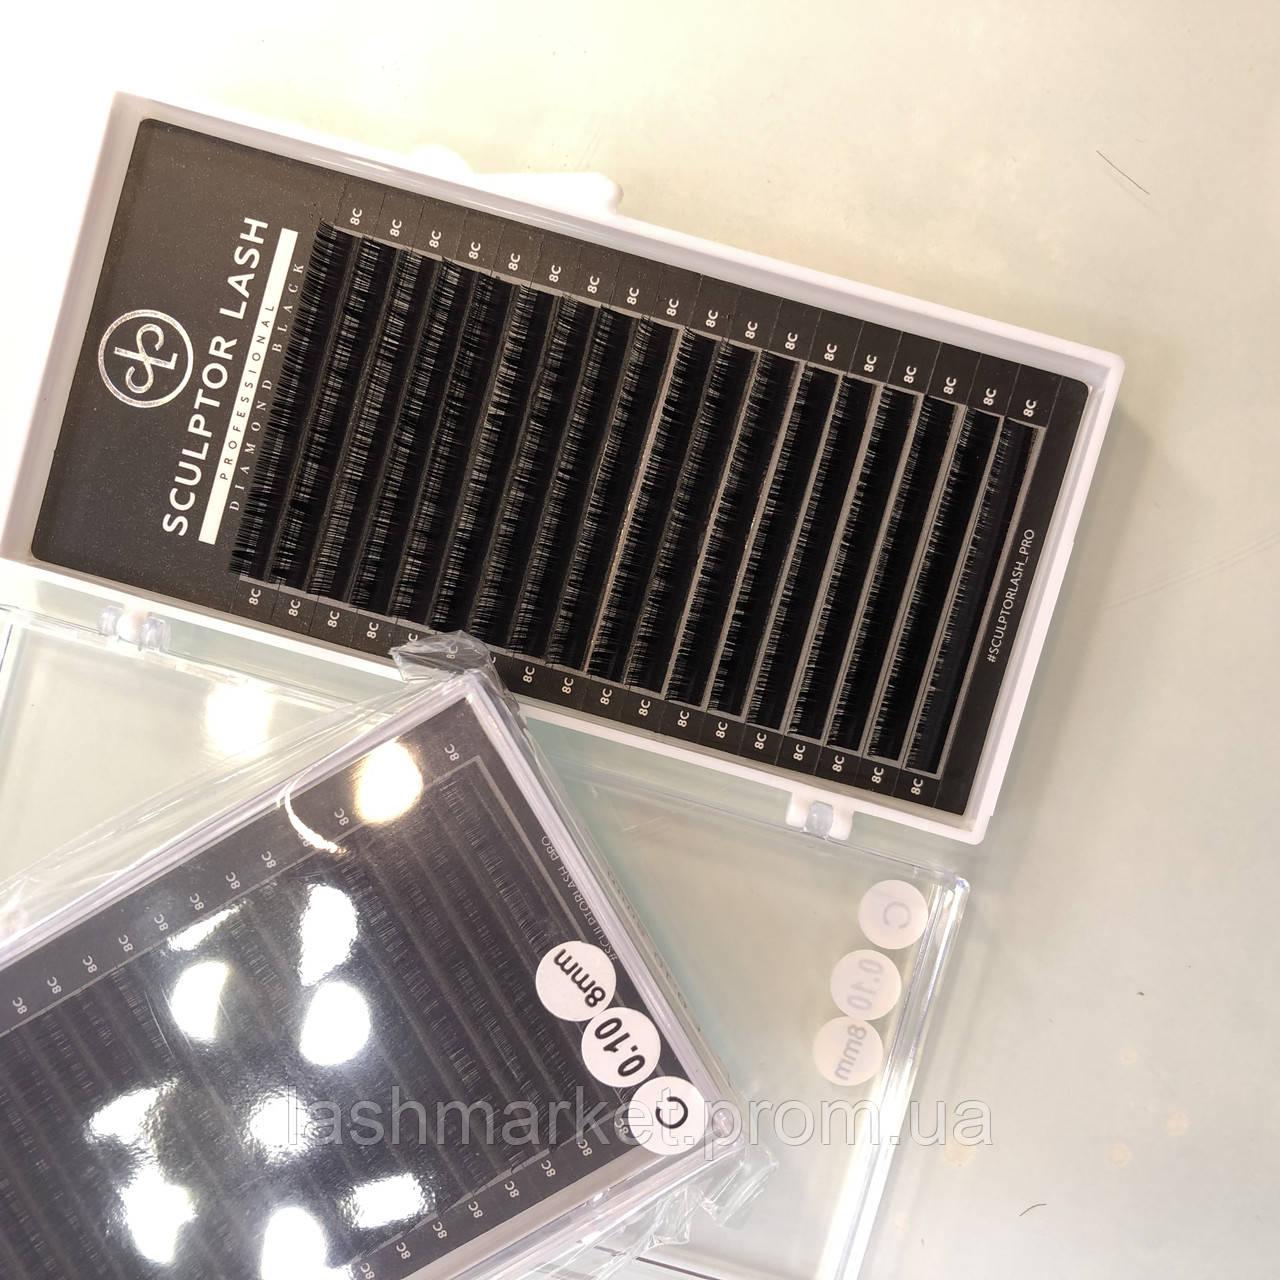 Ресницы C 0,10 * 7 mm Sculptor Lash Diamond Black